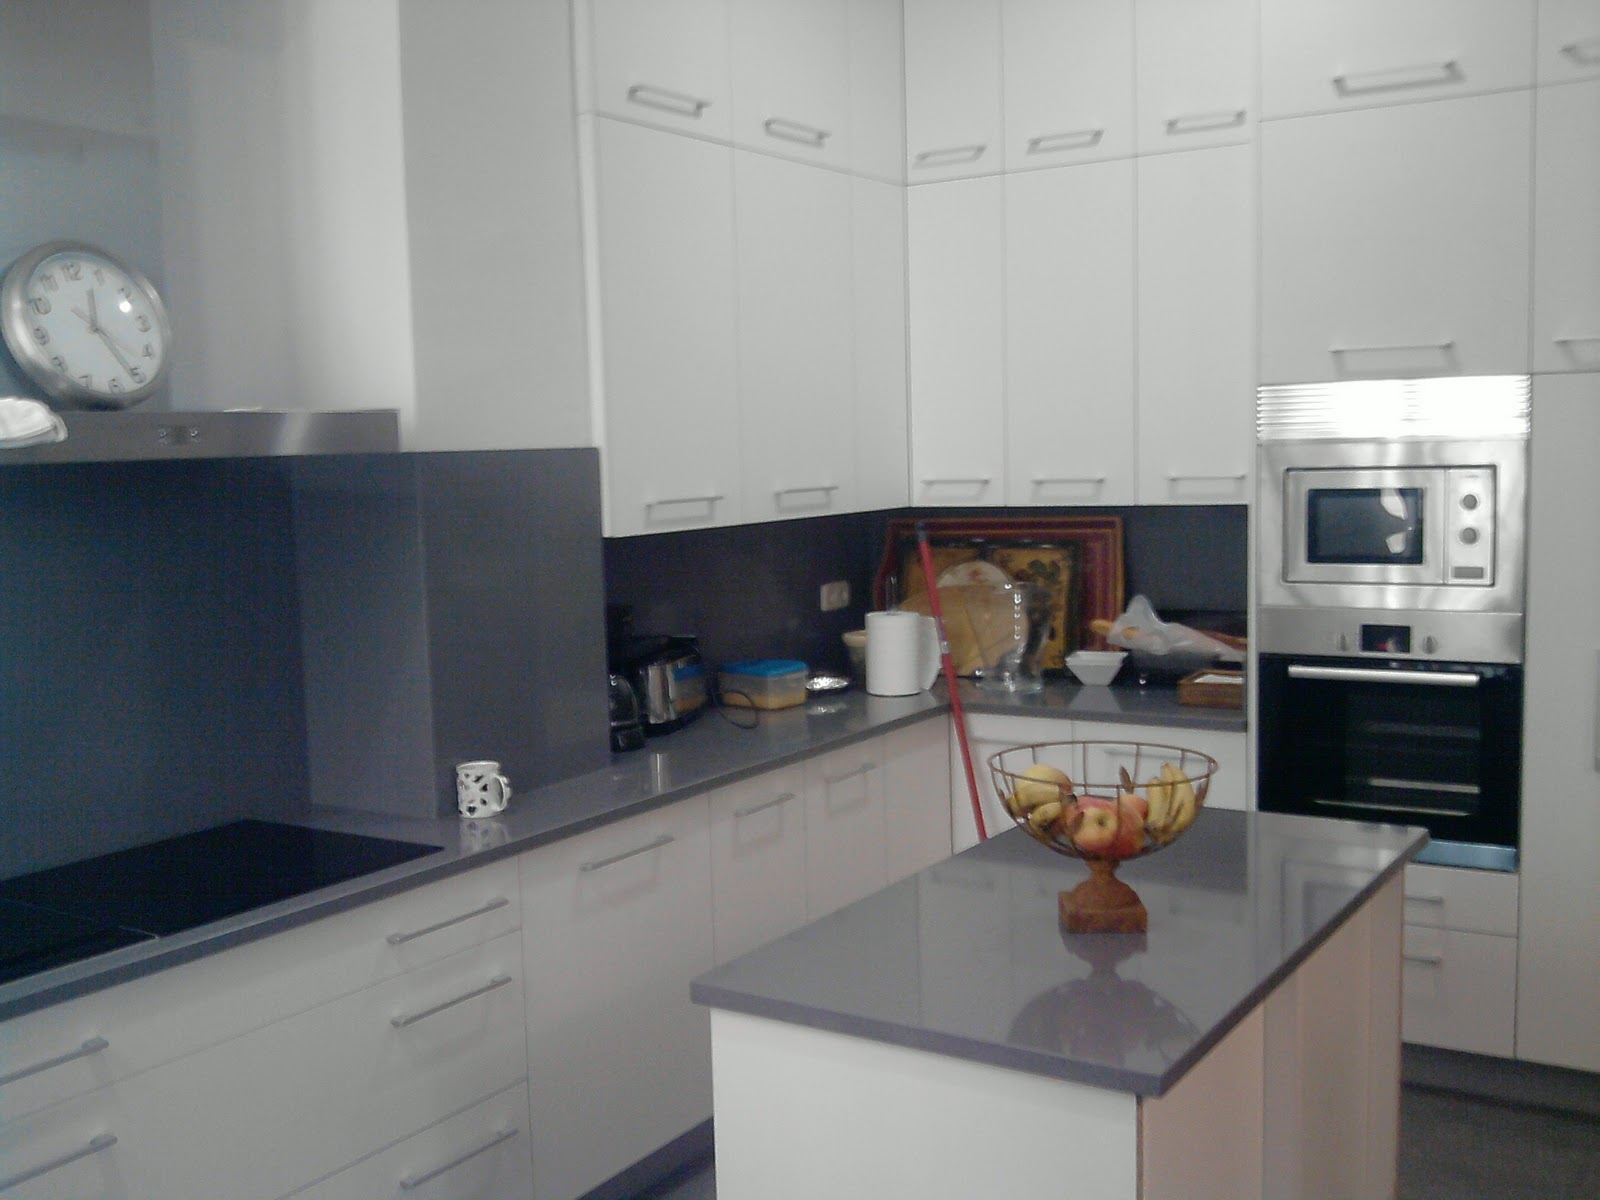 Cocinas fotos de cocinas - Cocinas con silestone ...